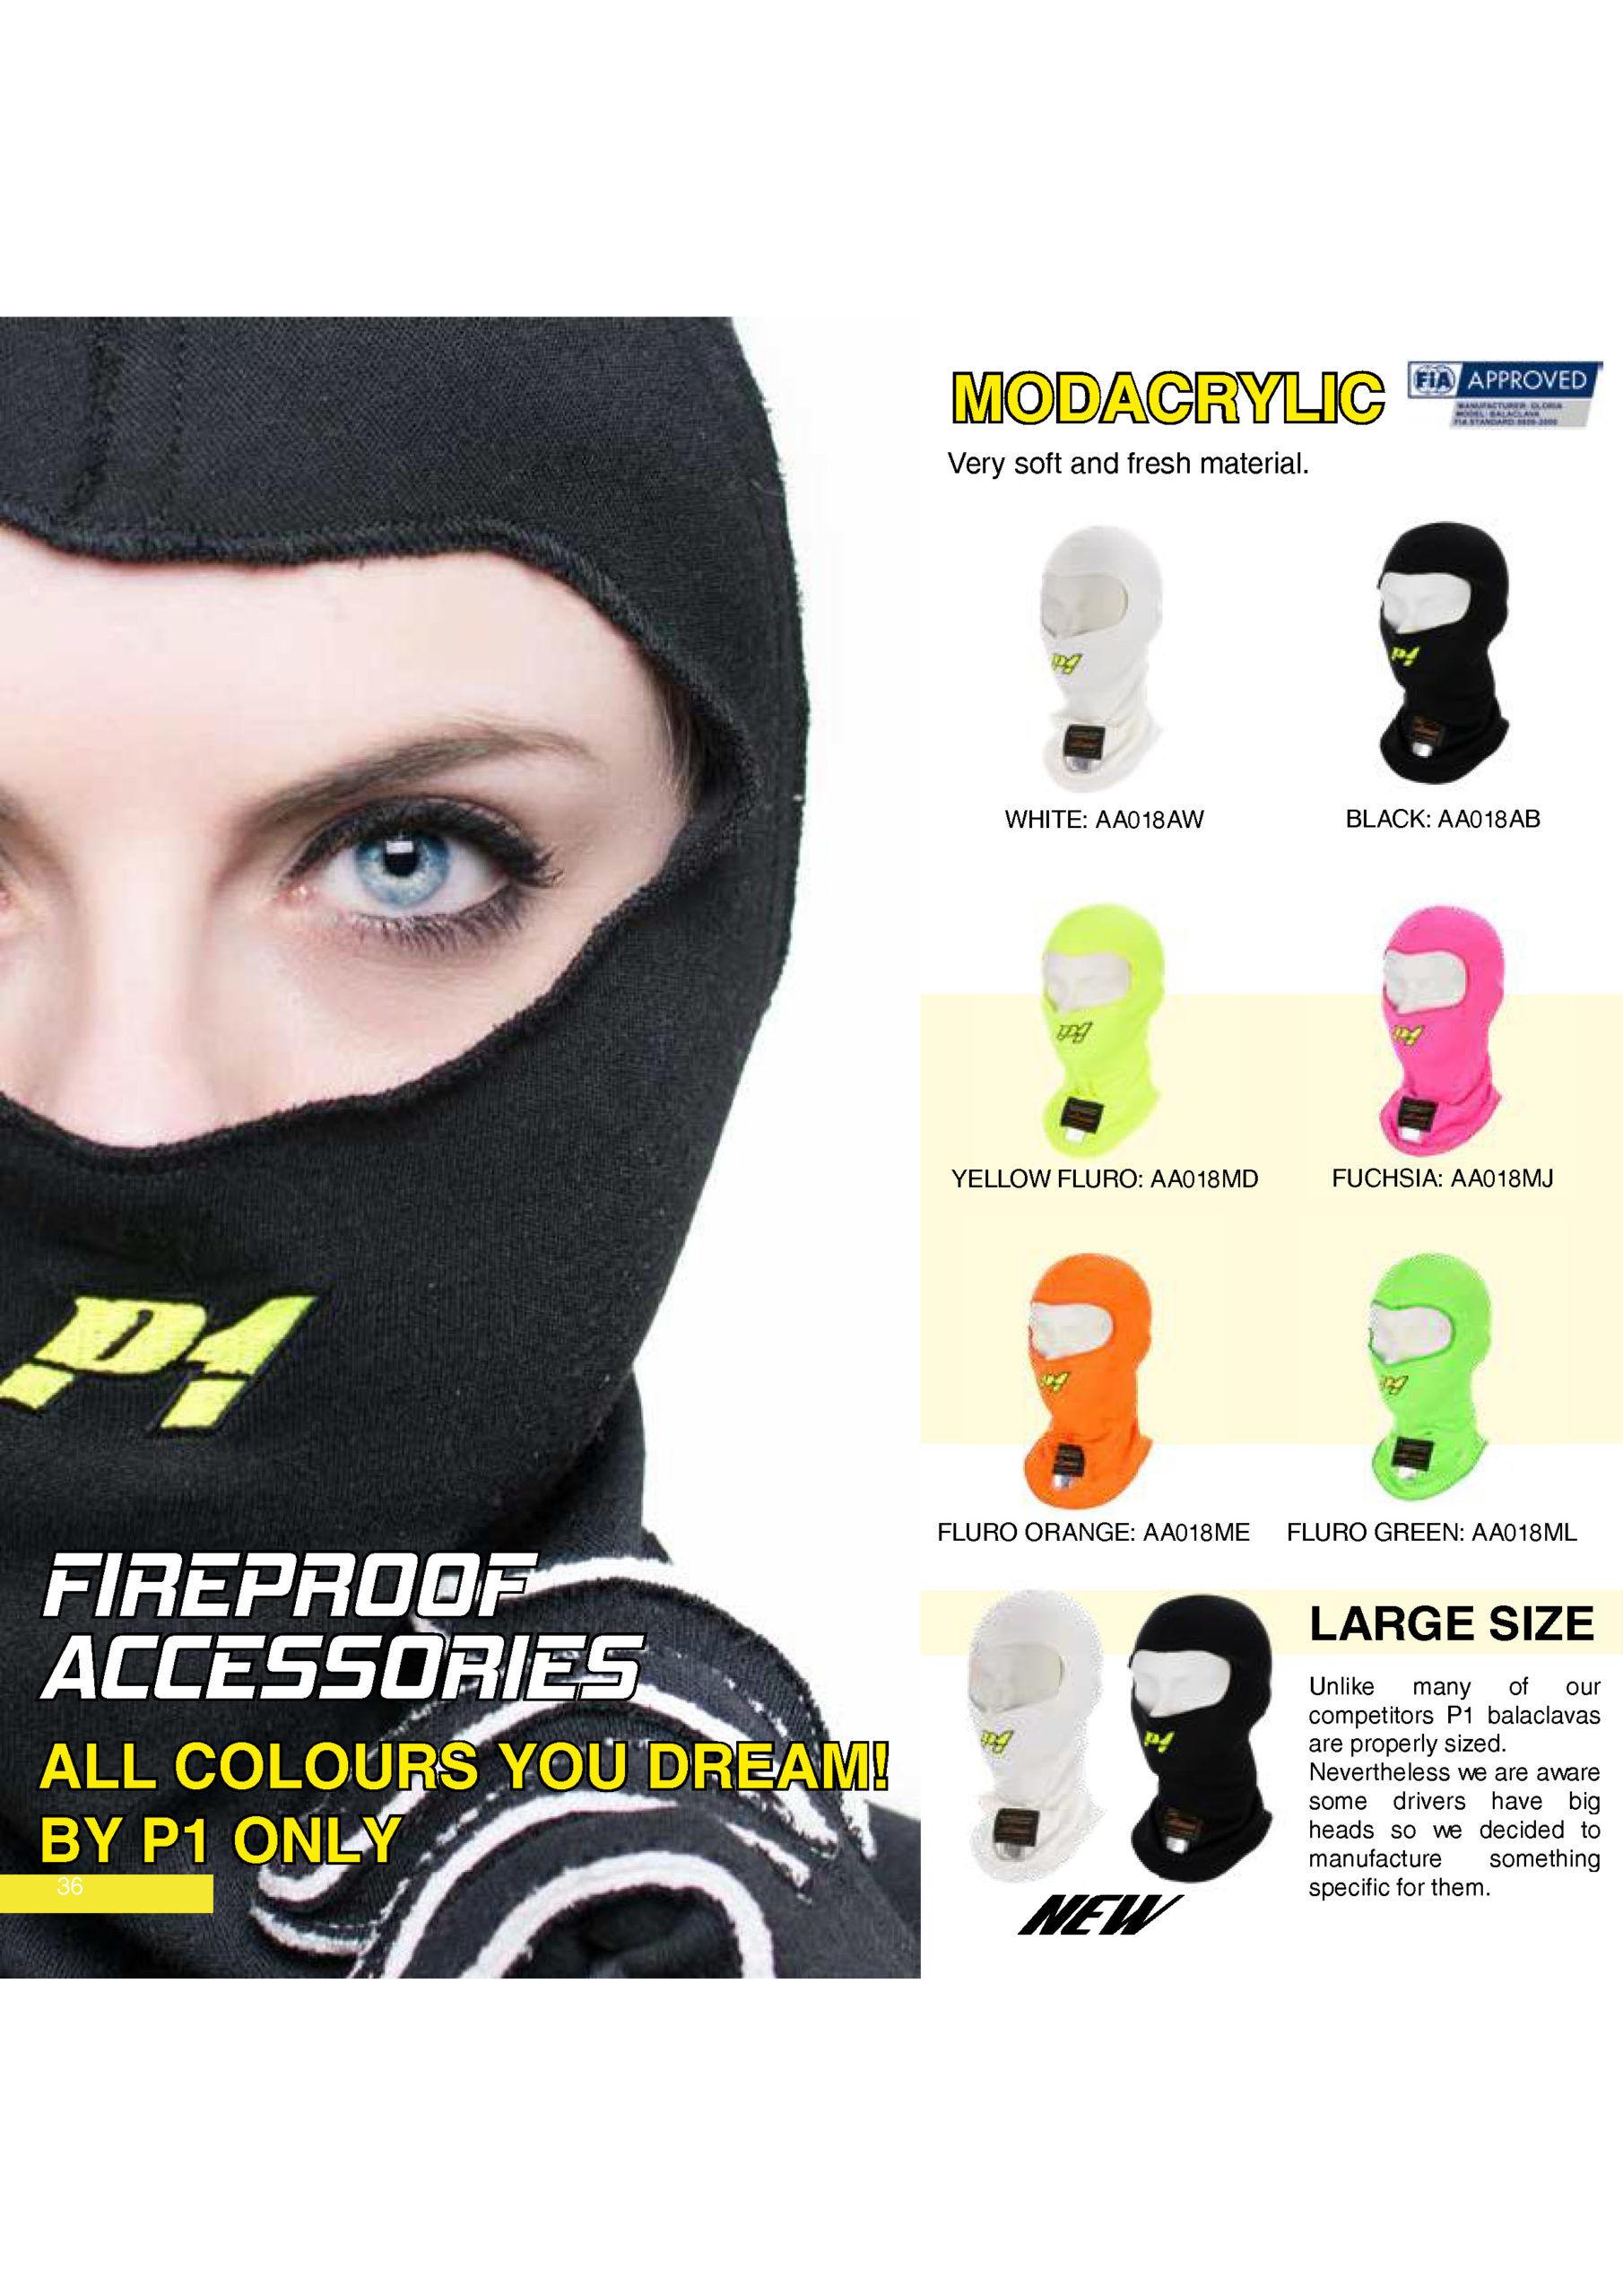 P1 Advanced Racewear Modacrylic Balaclava Racing